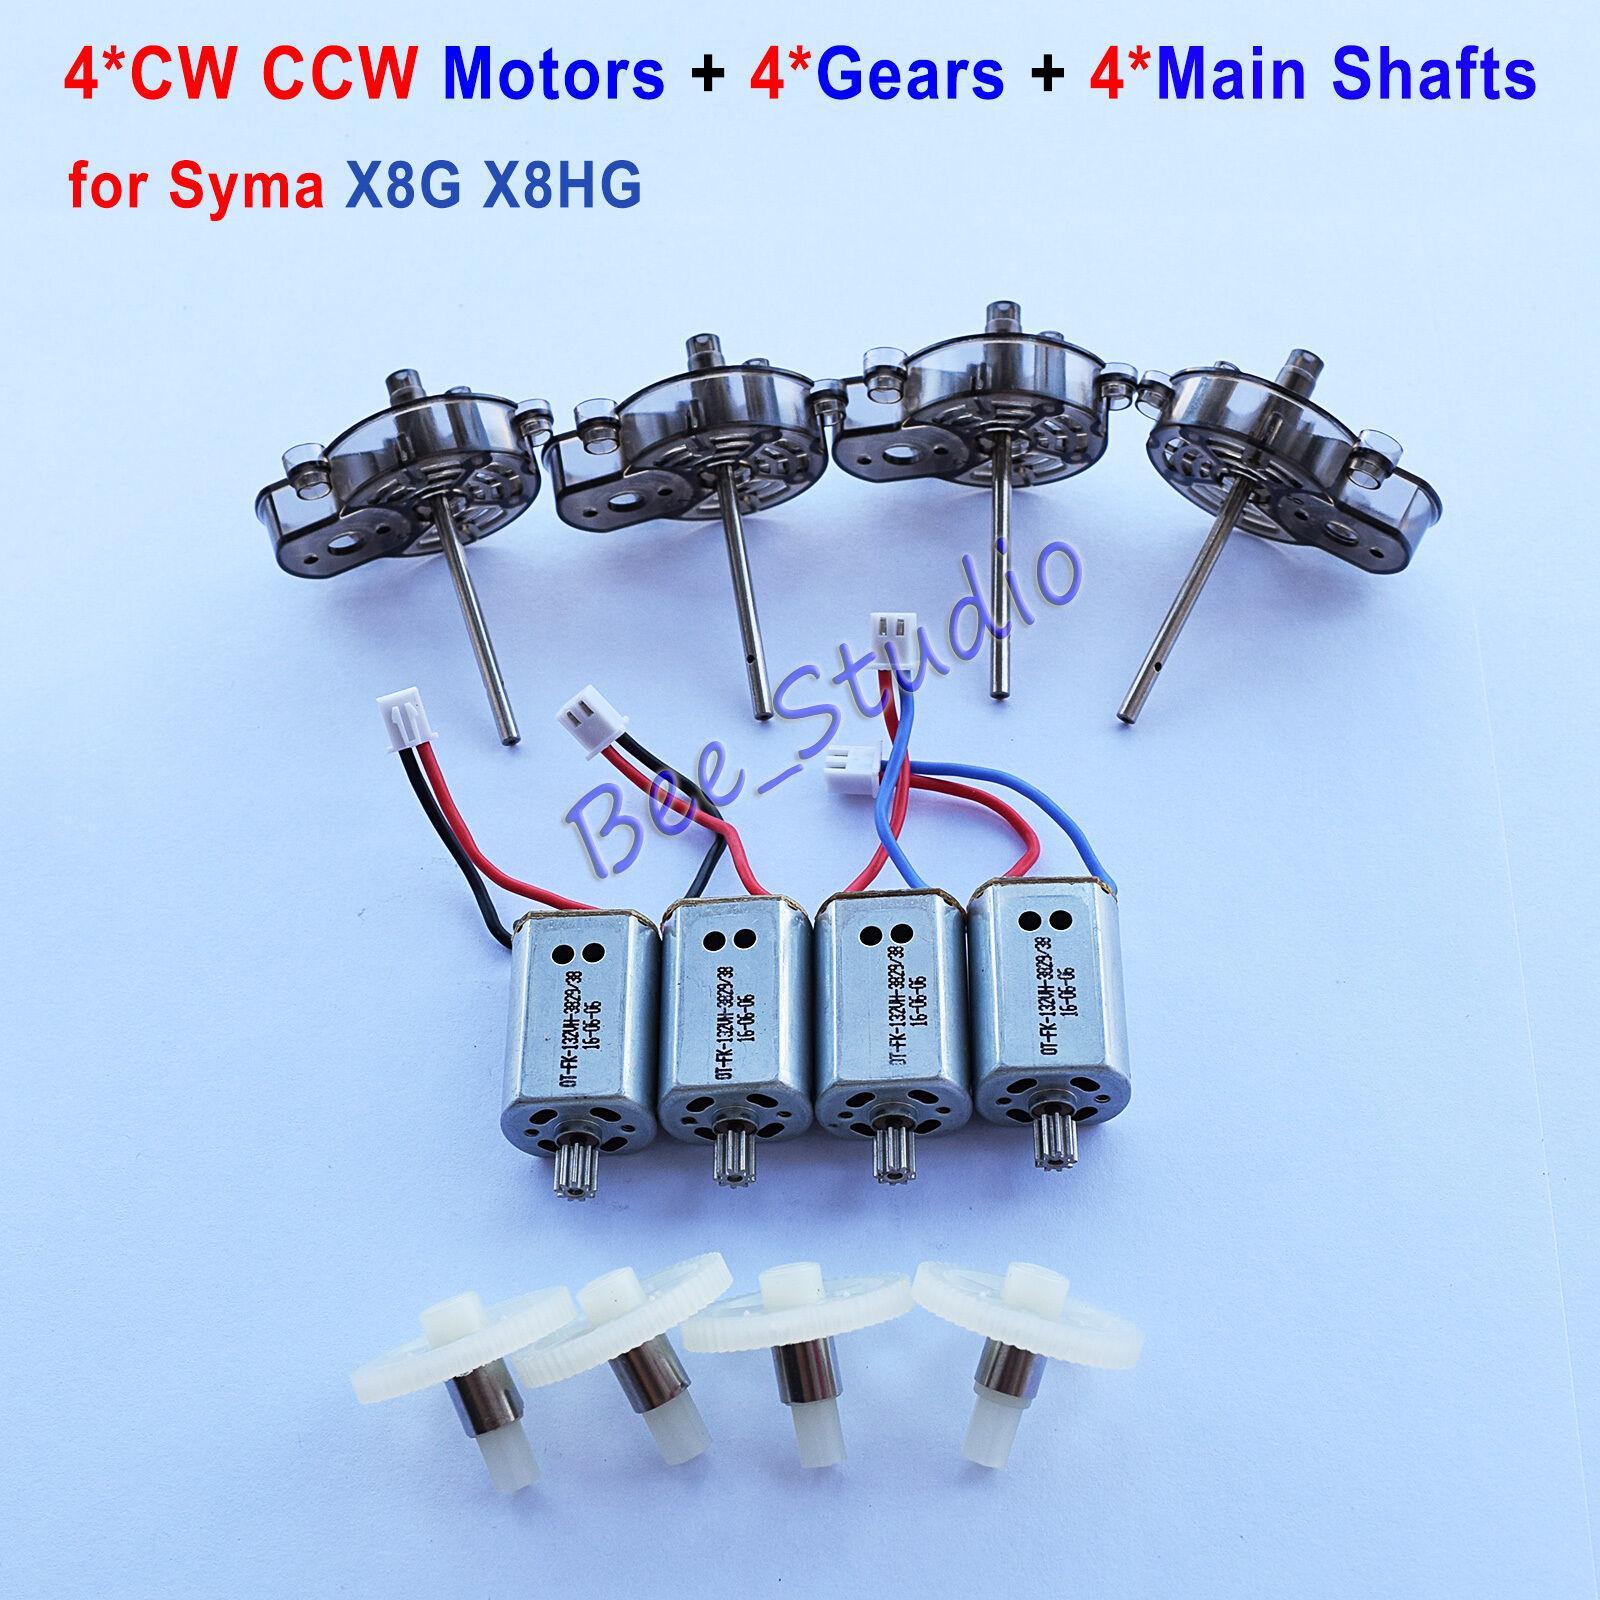 4pcs Original Main Shafts Gears Cw Ccw Motors Syma X8g X8hg Drone X8hc X8hw Remote Control Quadcopter Rc Circuit Board 2 X 4